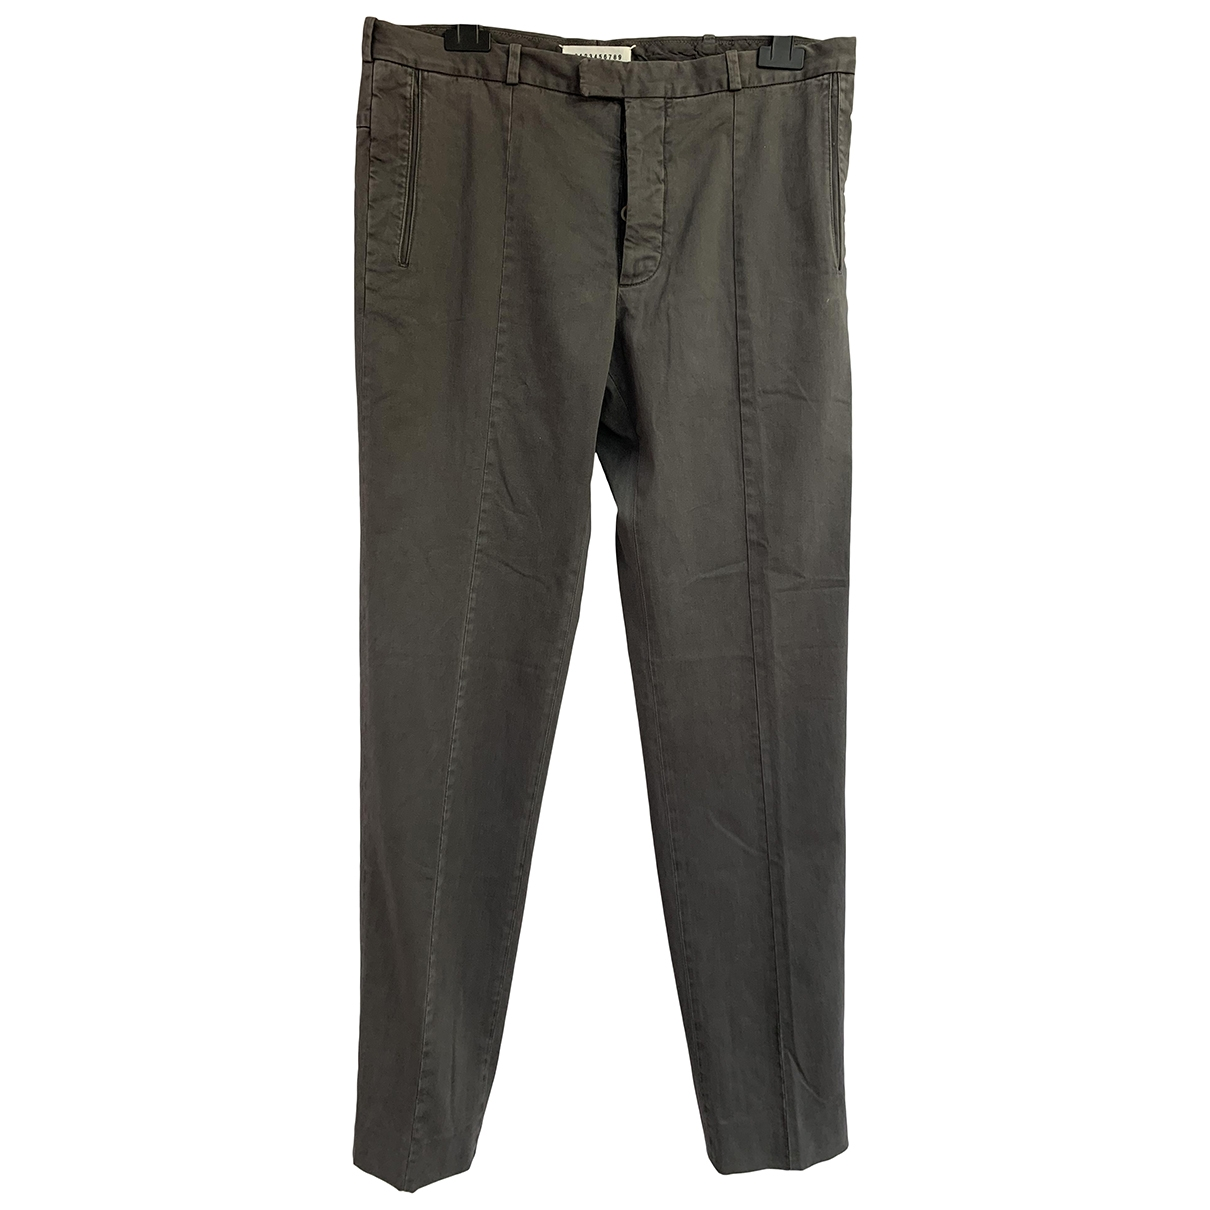 Pantalones en Algodon Maison Martin Margiela